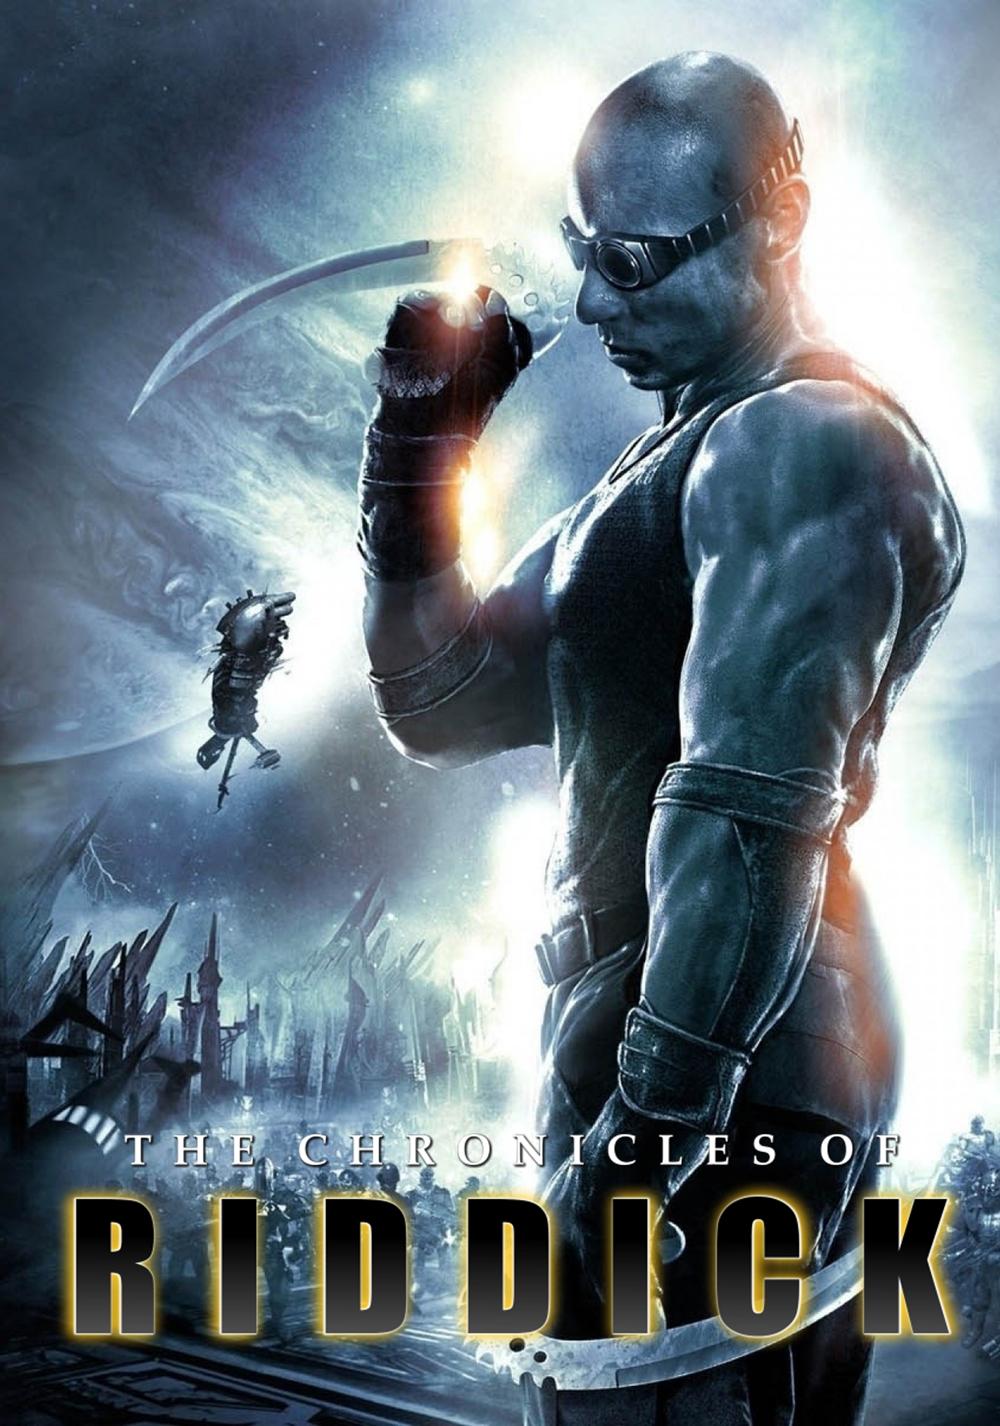 The Chronicles of Riddick | Movie fanart | fanart.tv